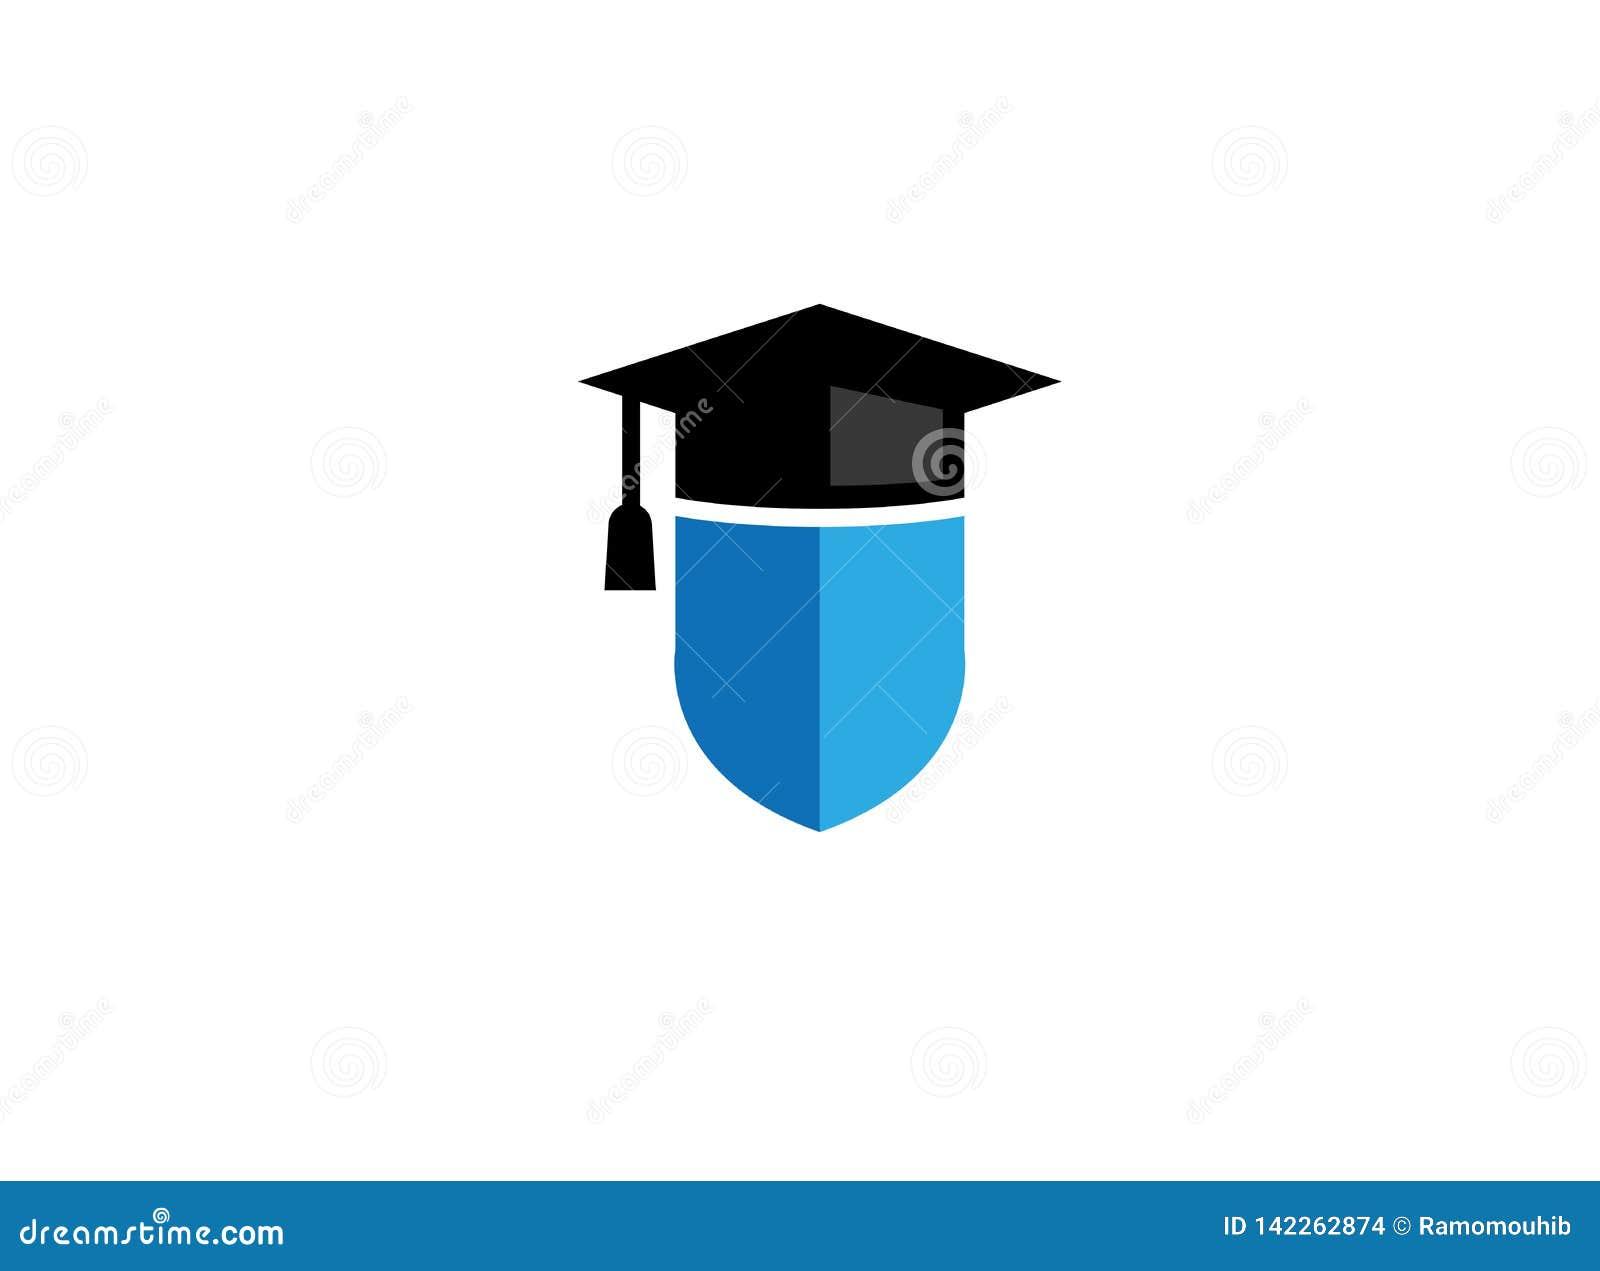 Шляпа градации на экране для логотипа